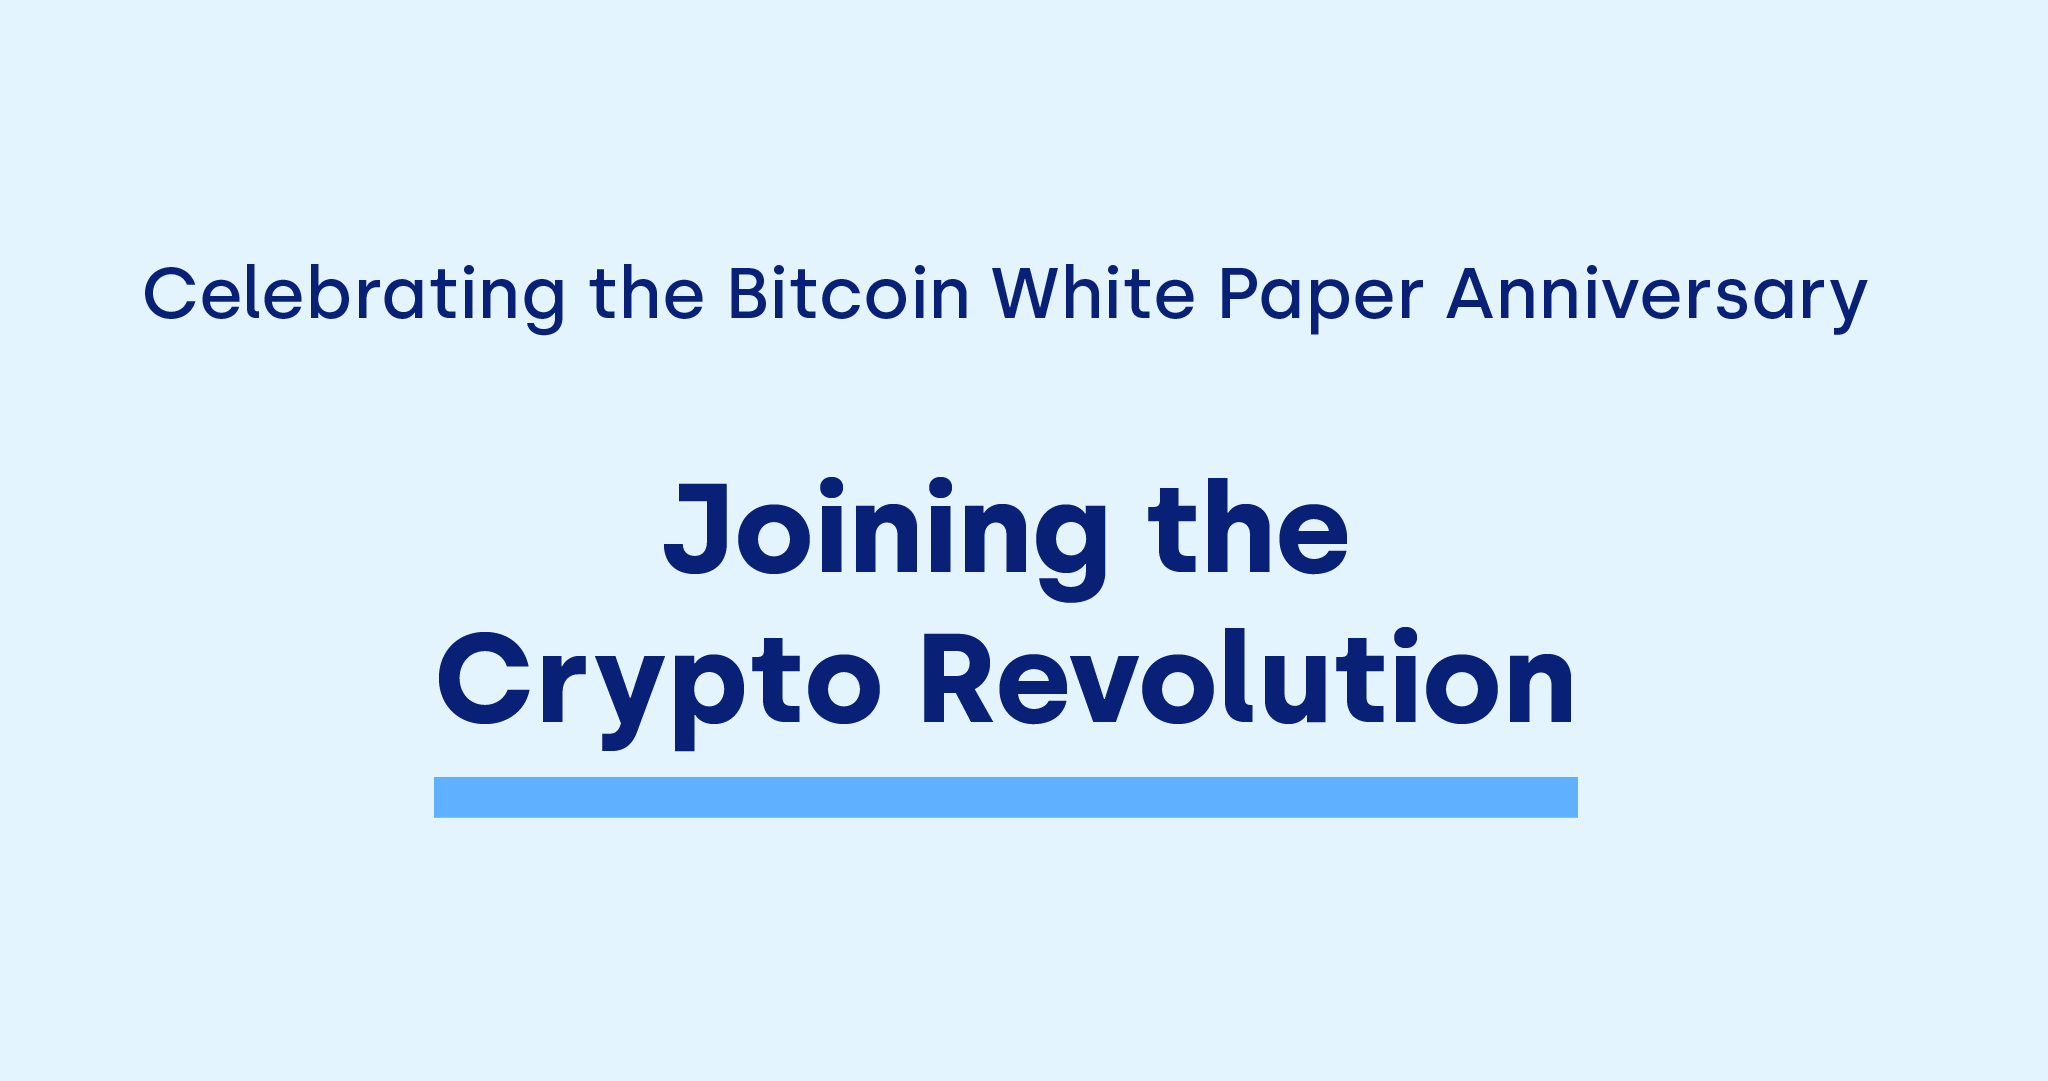 OKCoin celebrates the Bitcoin white paper anniversary